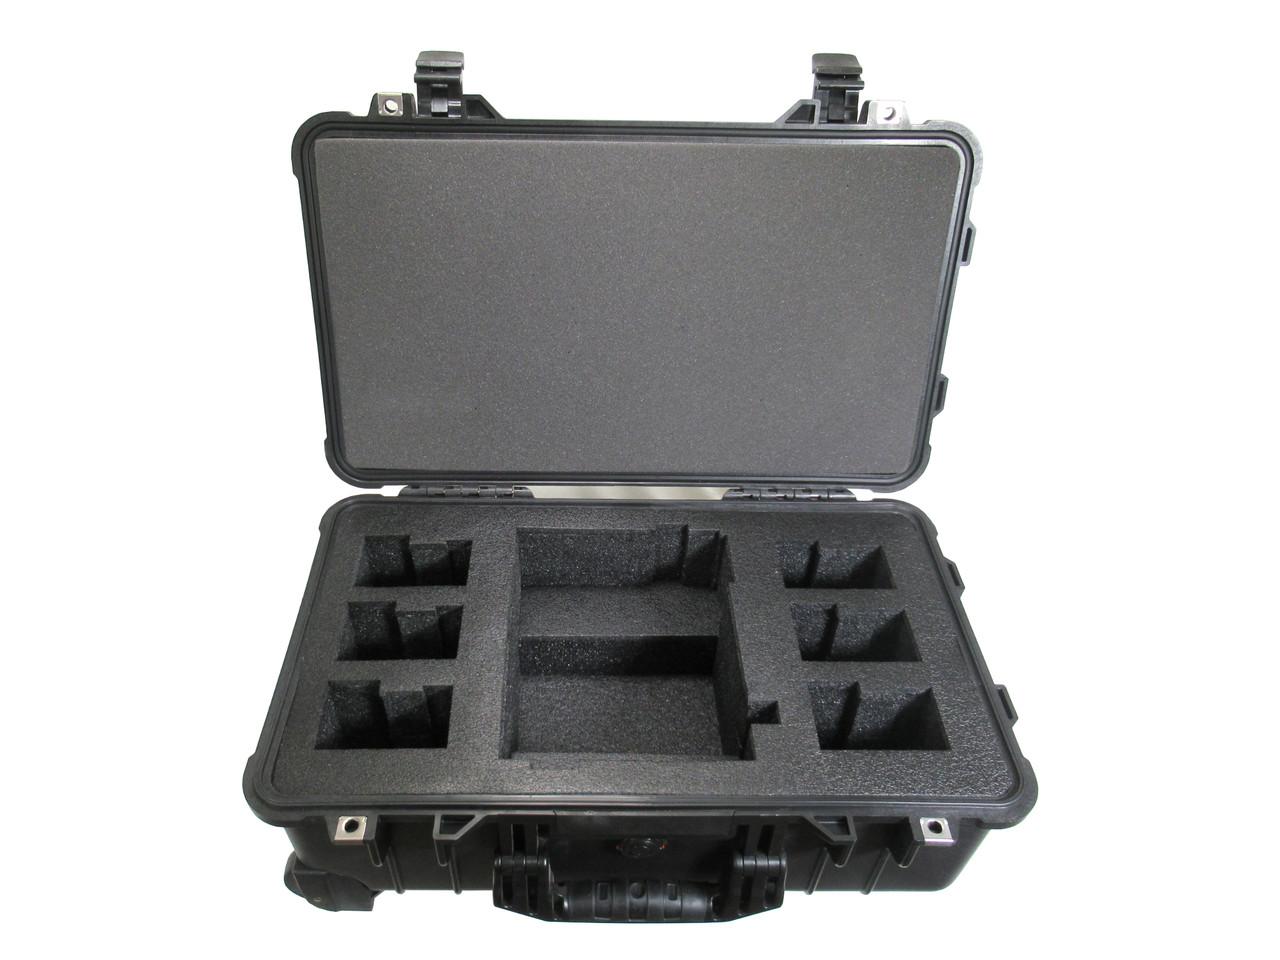 ANTON BAUER LP-2 with 6 Gold Mount Batteries Case